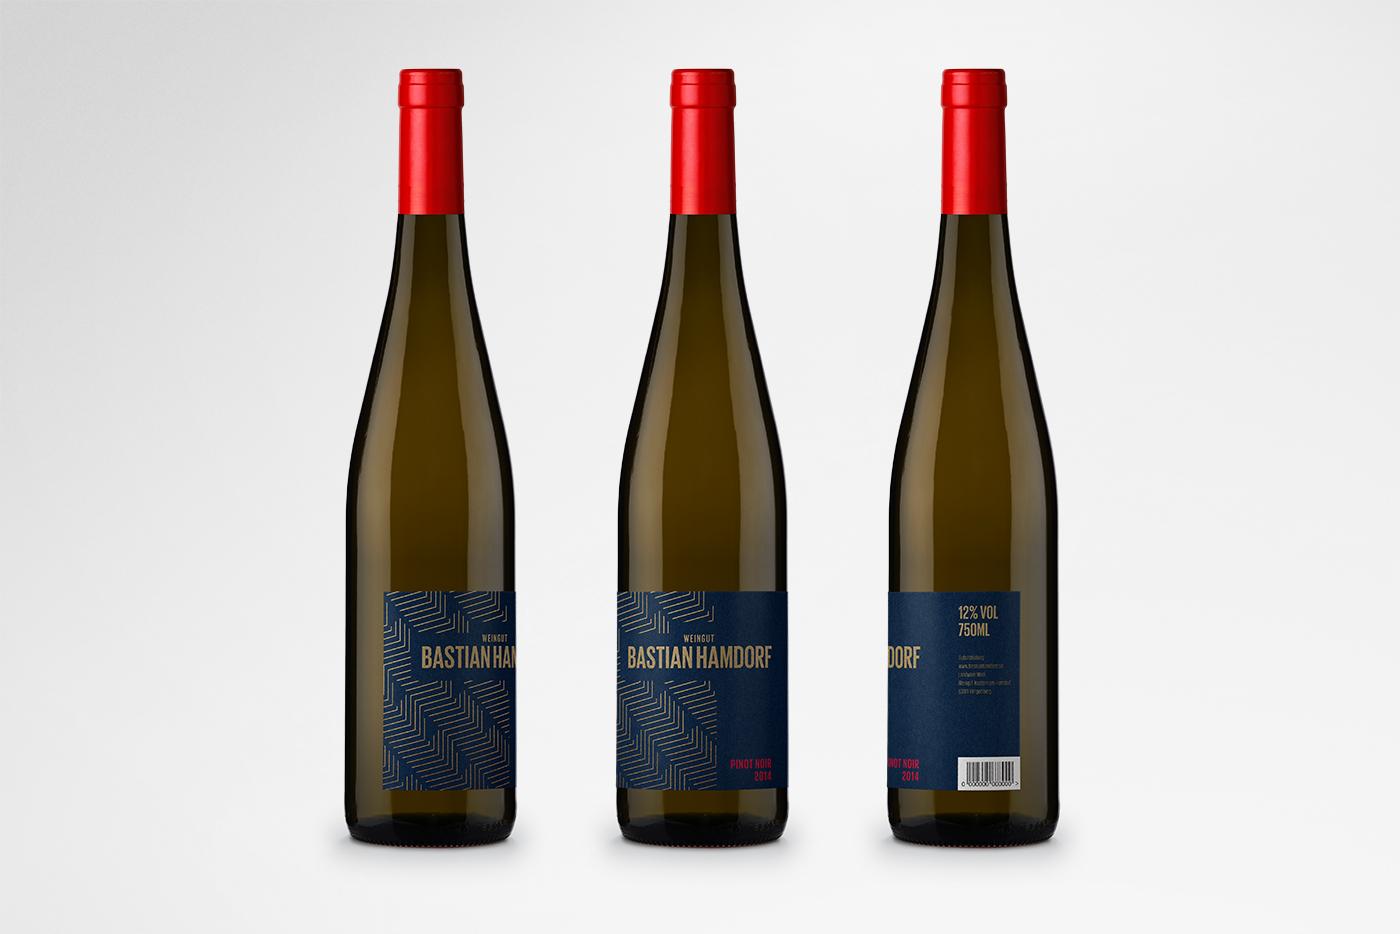 Weingut Bastian Hamdorf Pinot Noir 2014